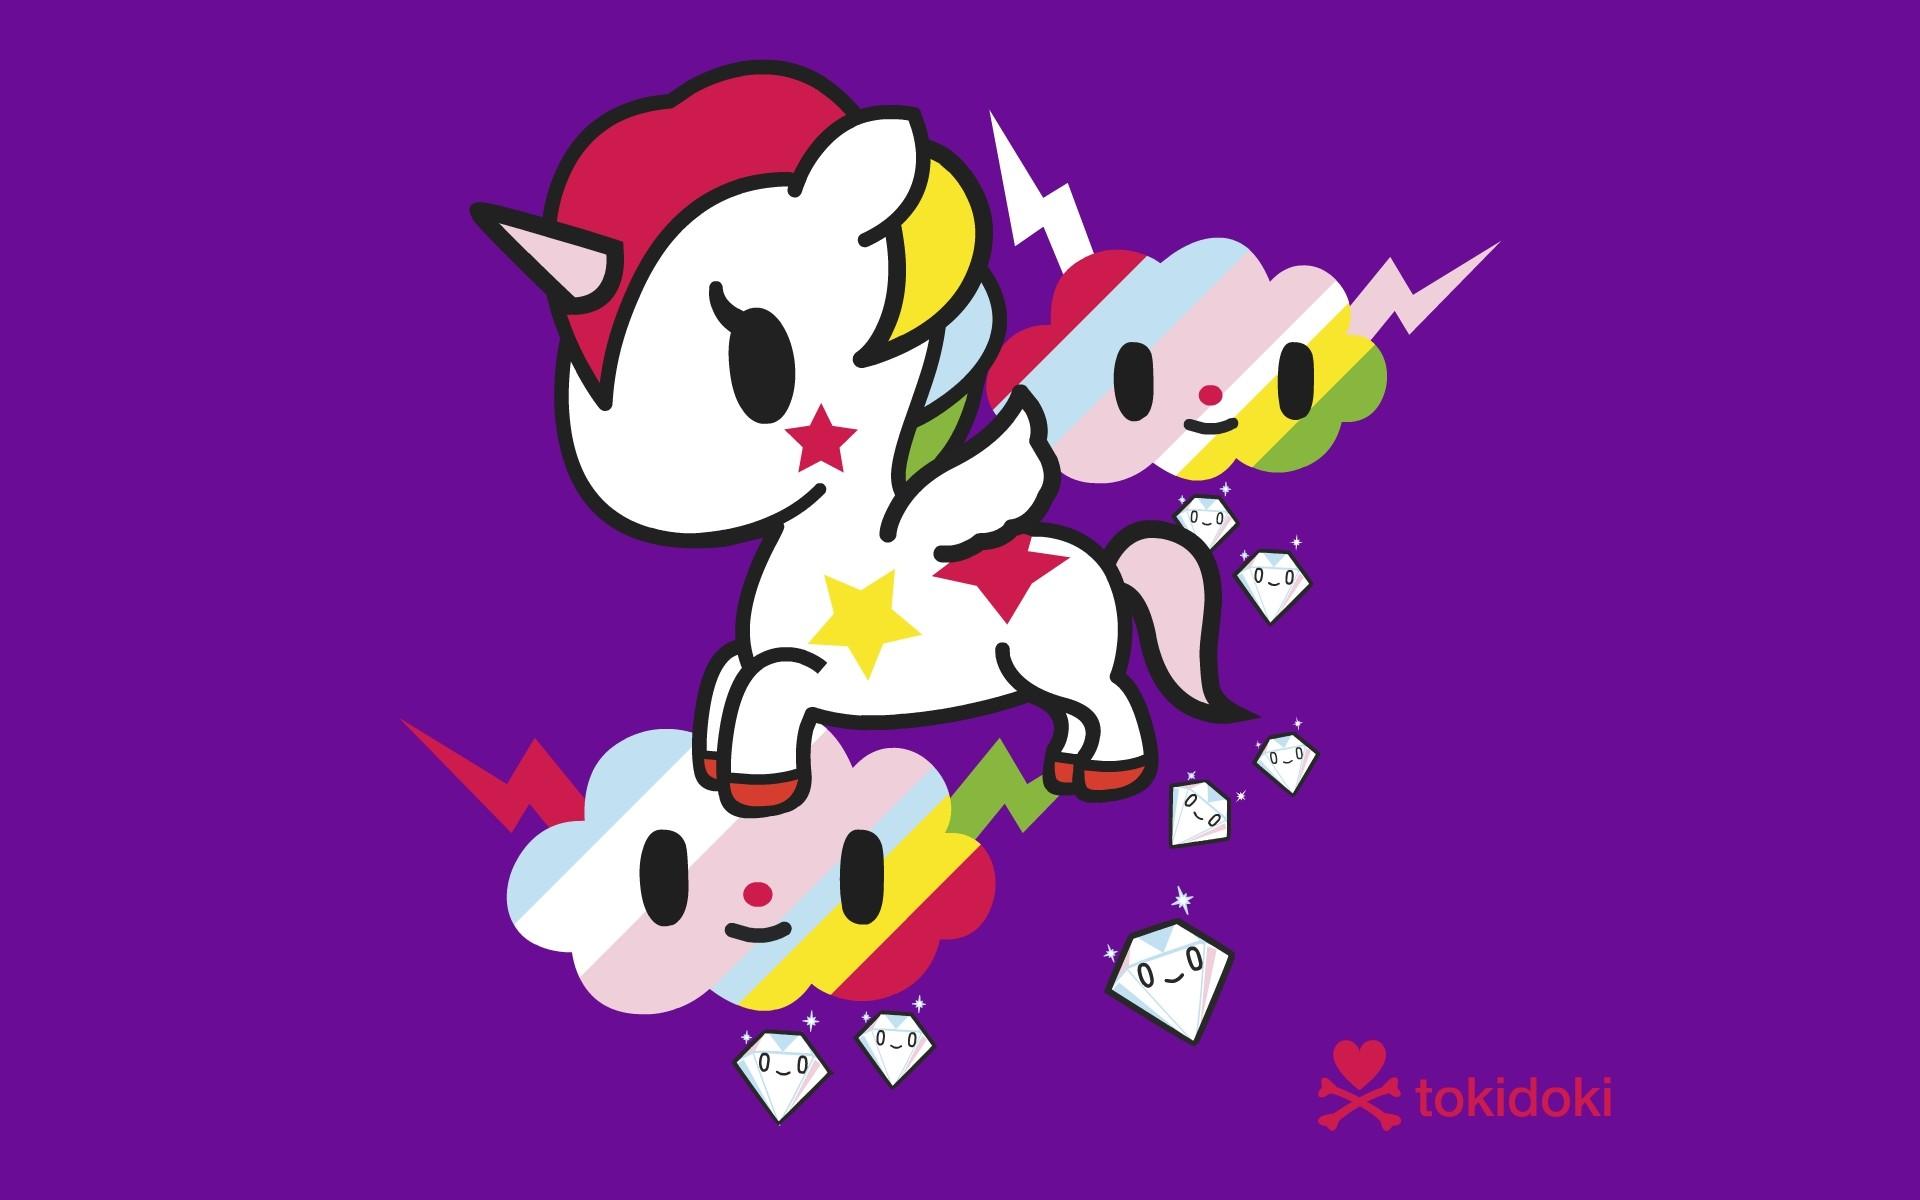 Tokidoki Unicorno wallpaper 261881